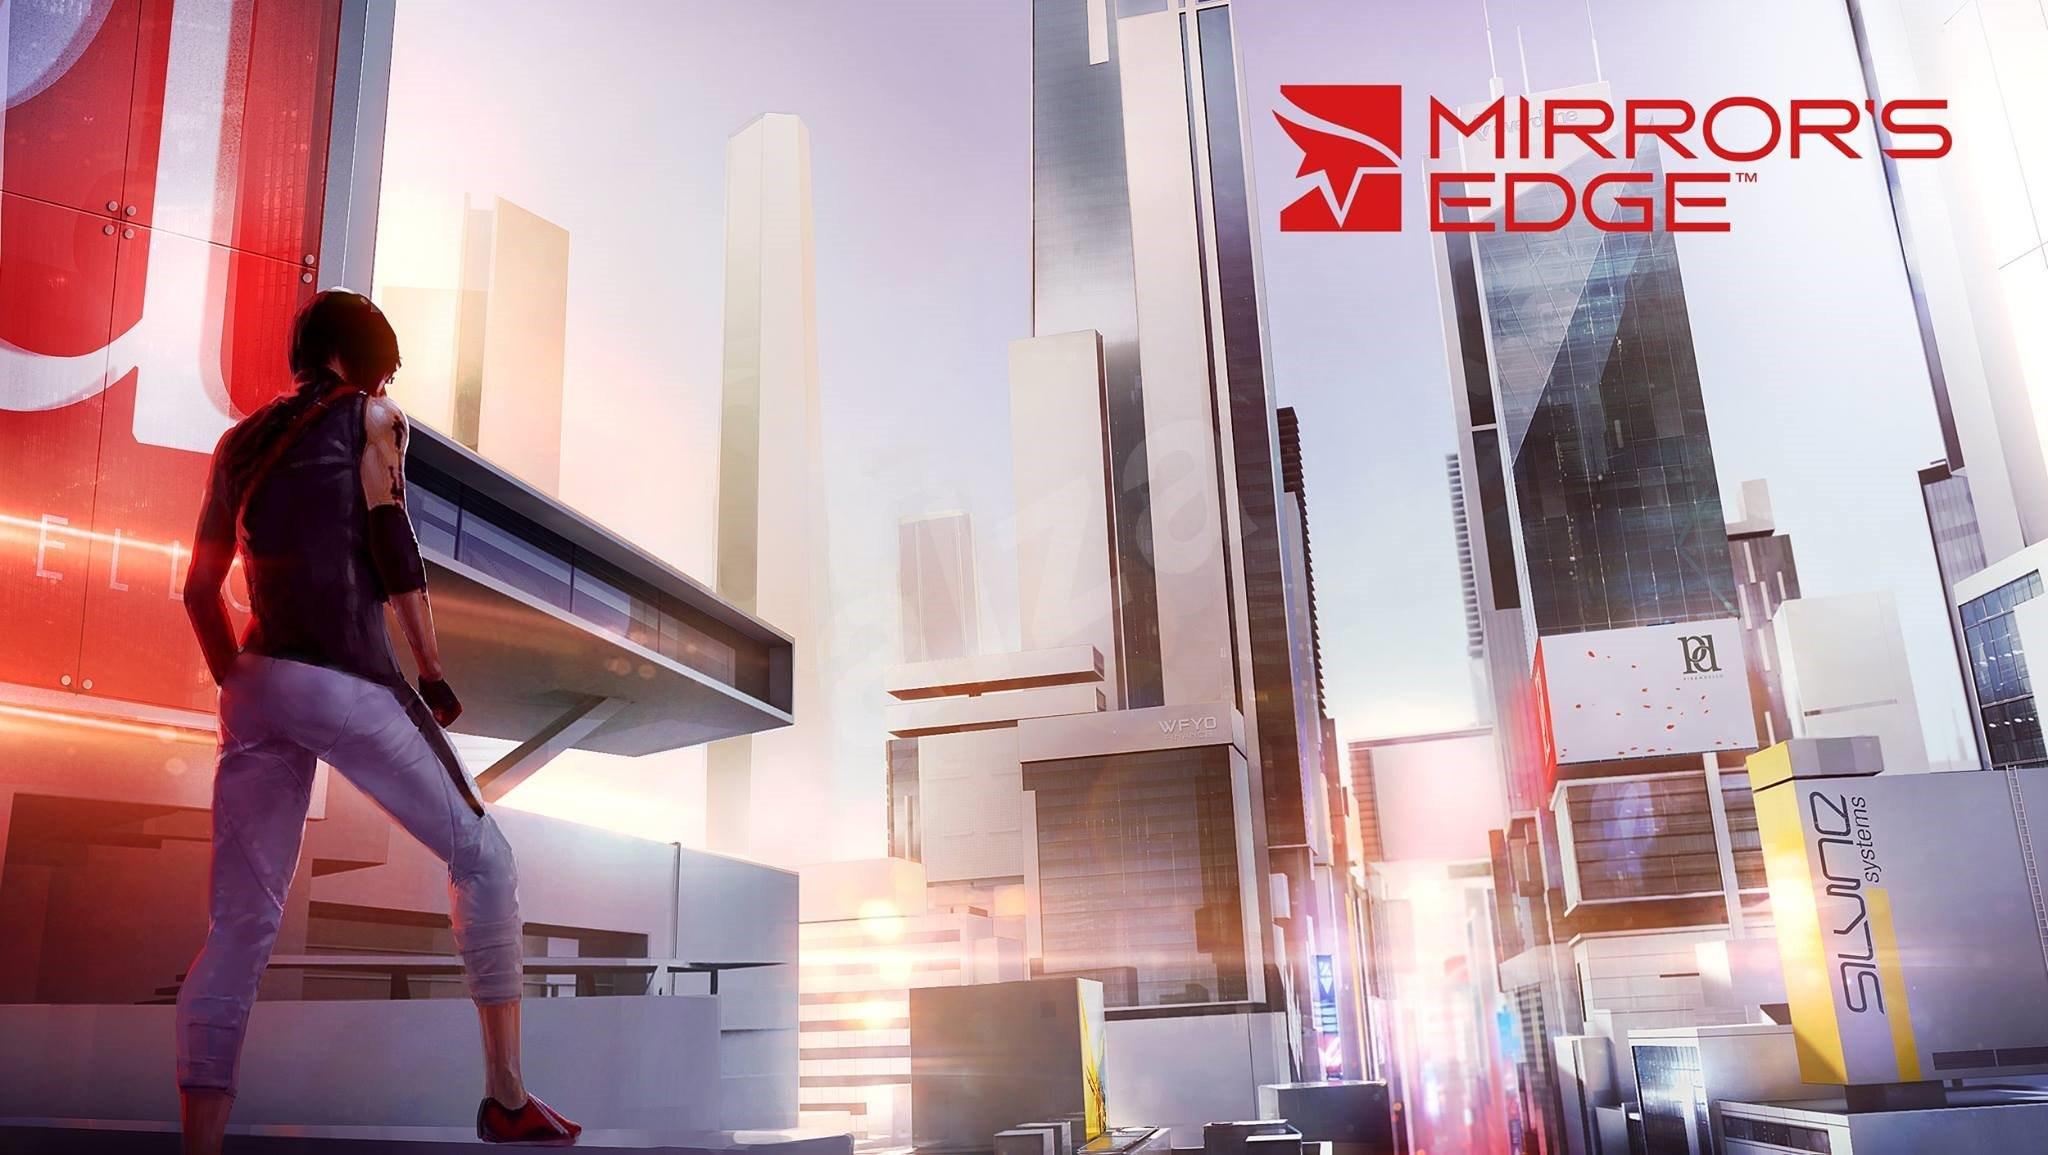 mirror 39 s edge 2 catalyst ps4 spiel f r die konsole. Black Bedroom Furniture Sets. Home Design Ideas